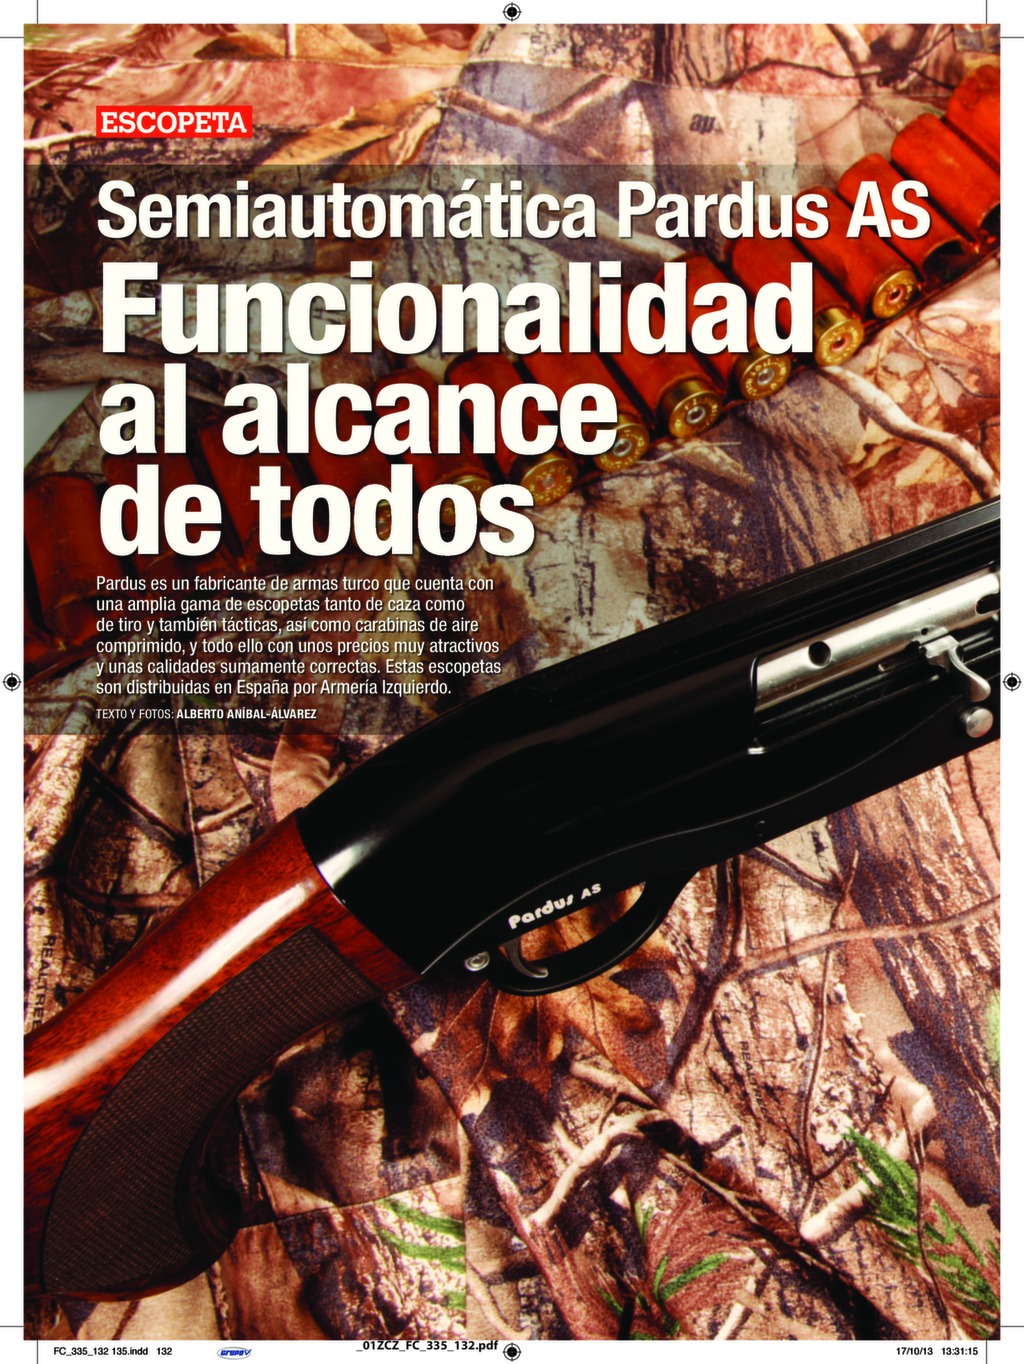 pdf-151-page-00001.jpg